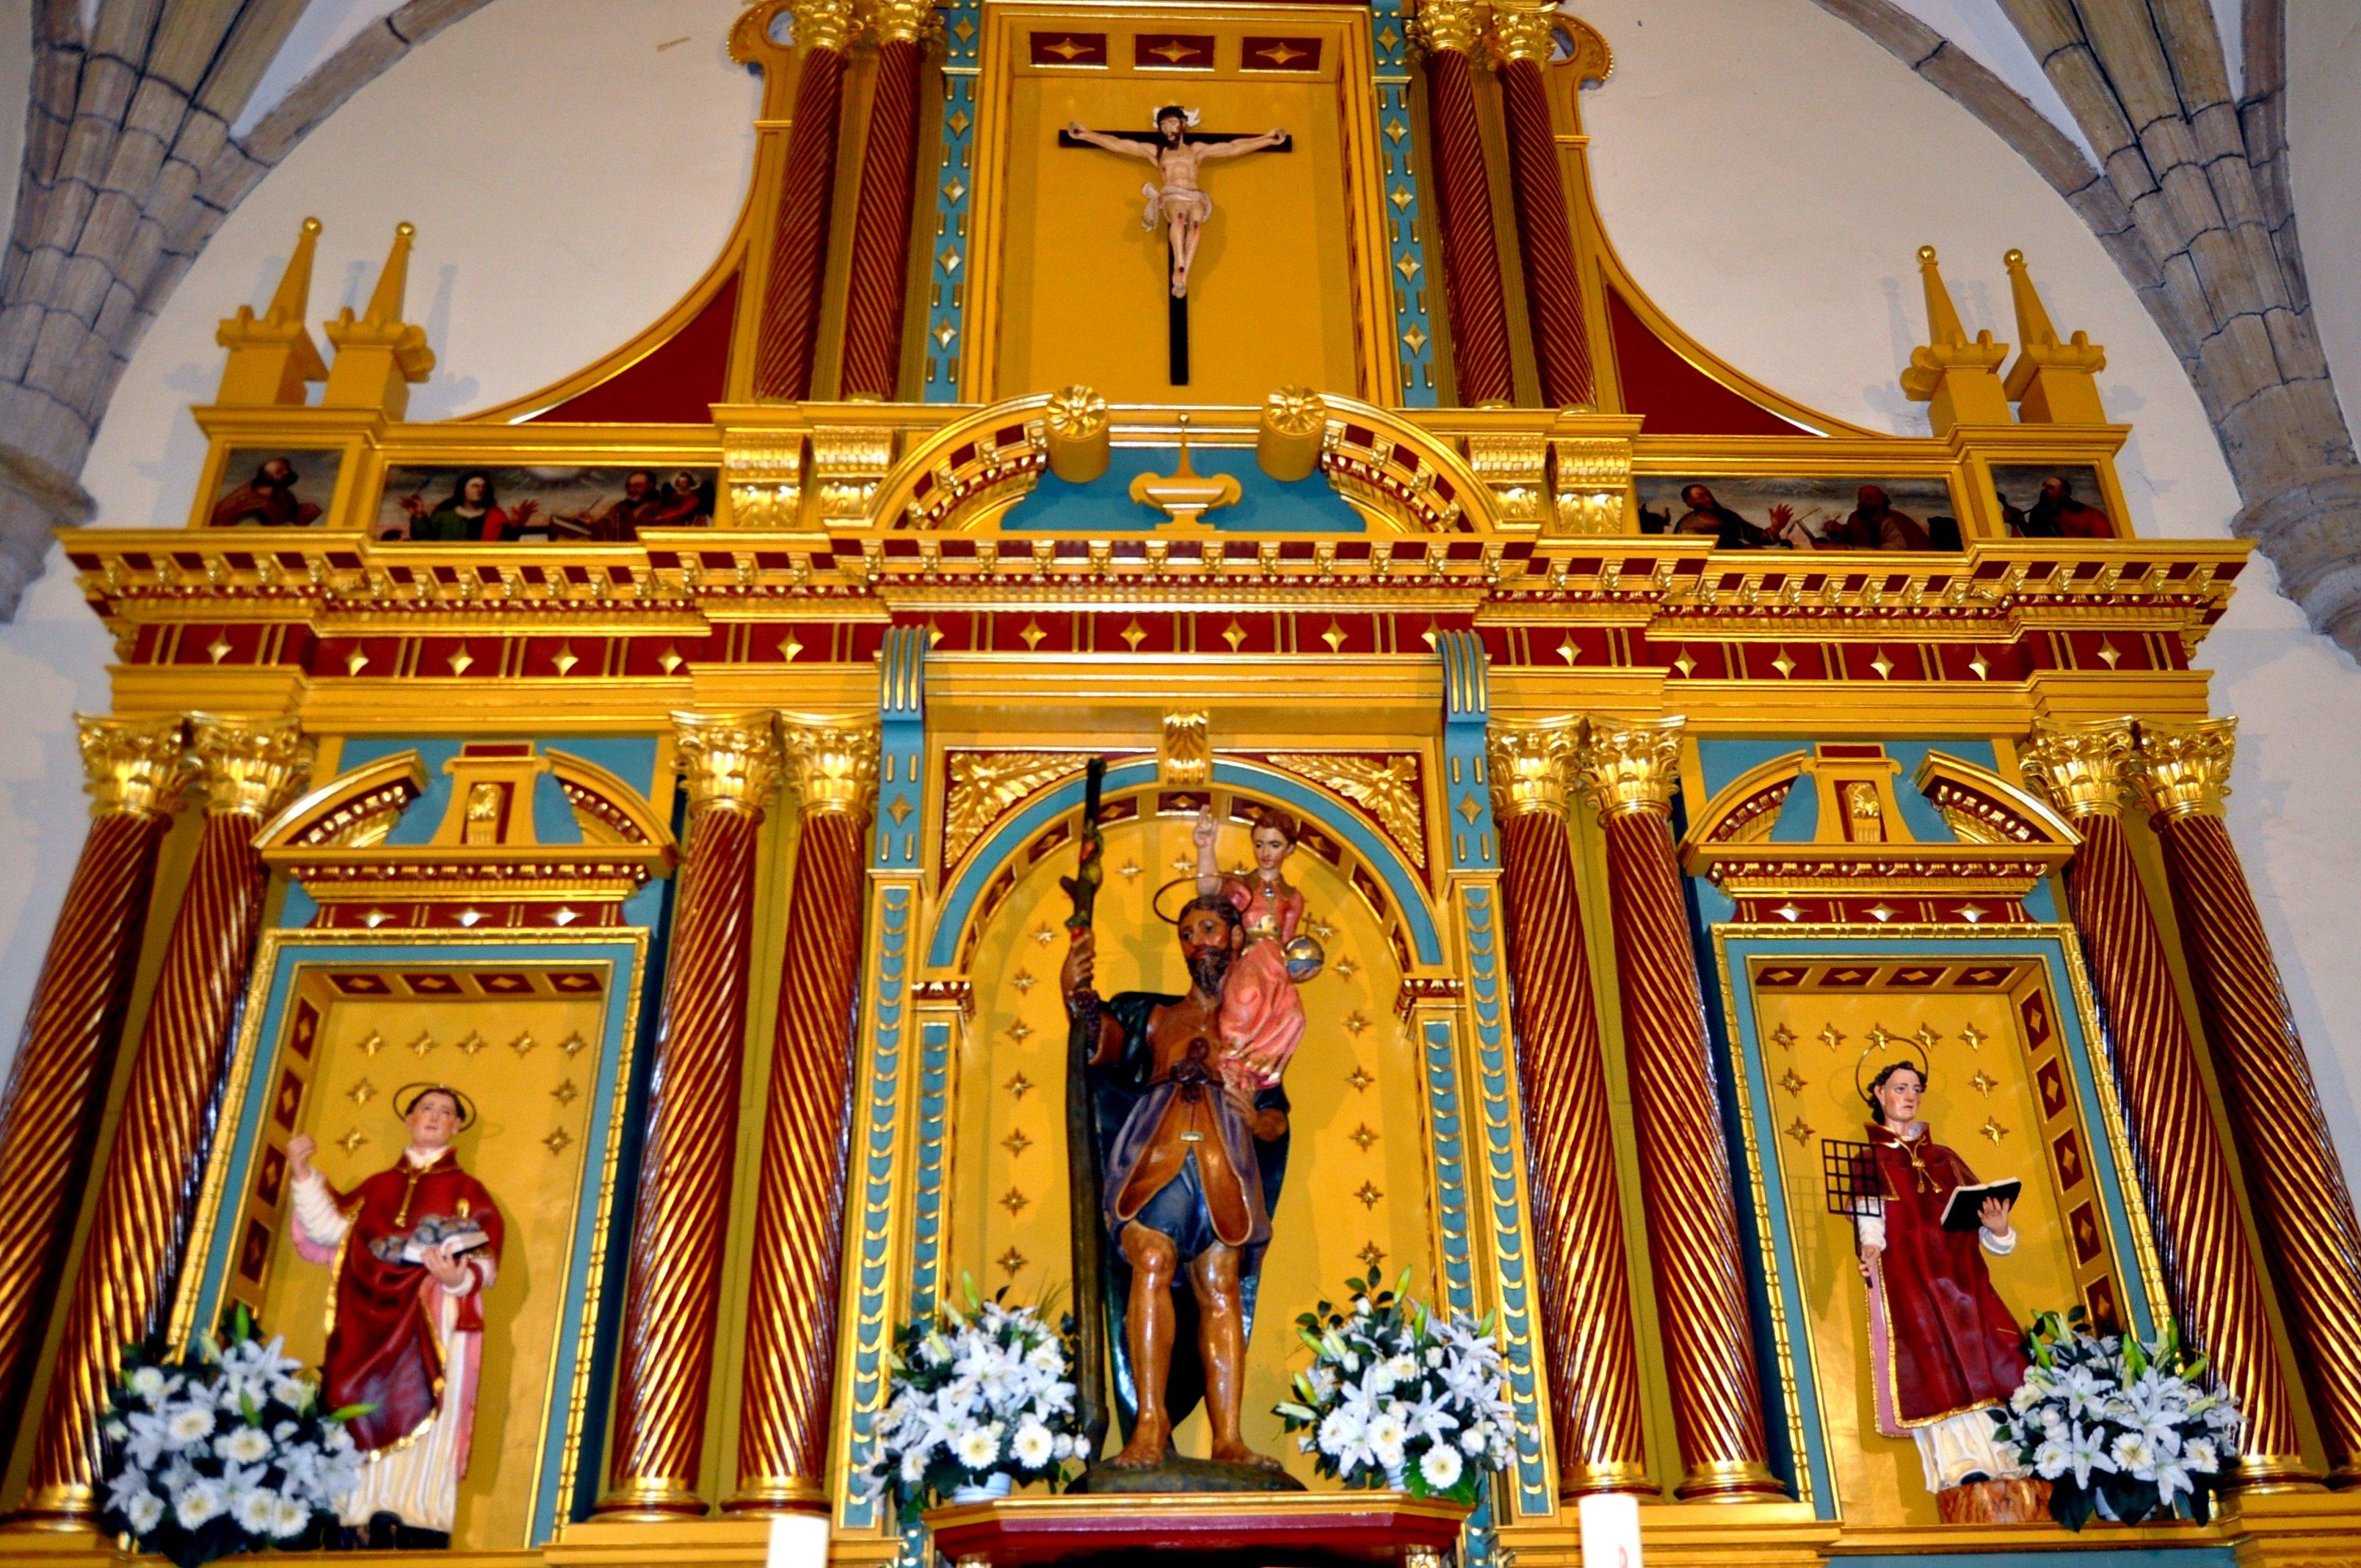 Cubillos del Sil. Retablo iglesia San Cristóbal (s. XVII). Recien restaurado.